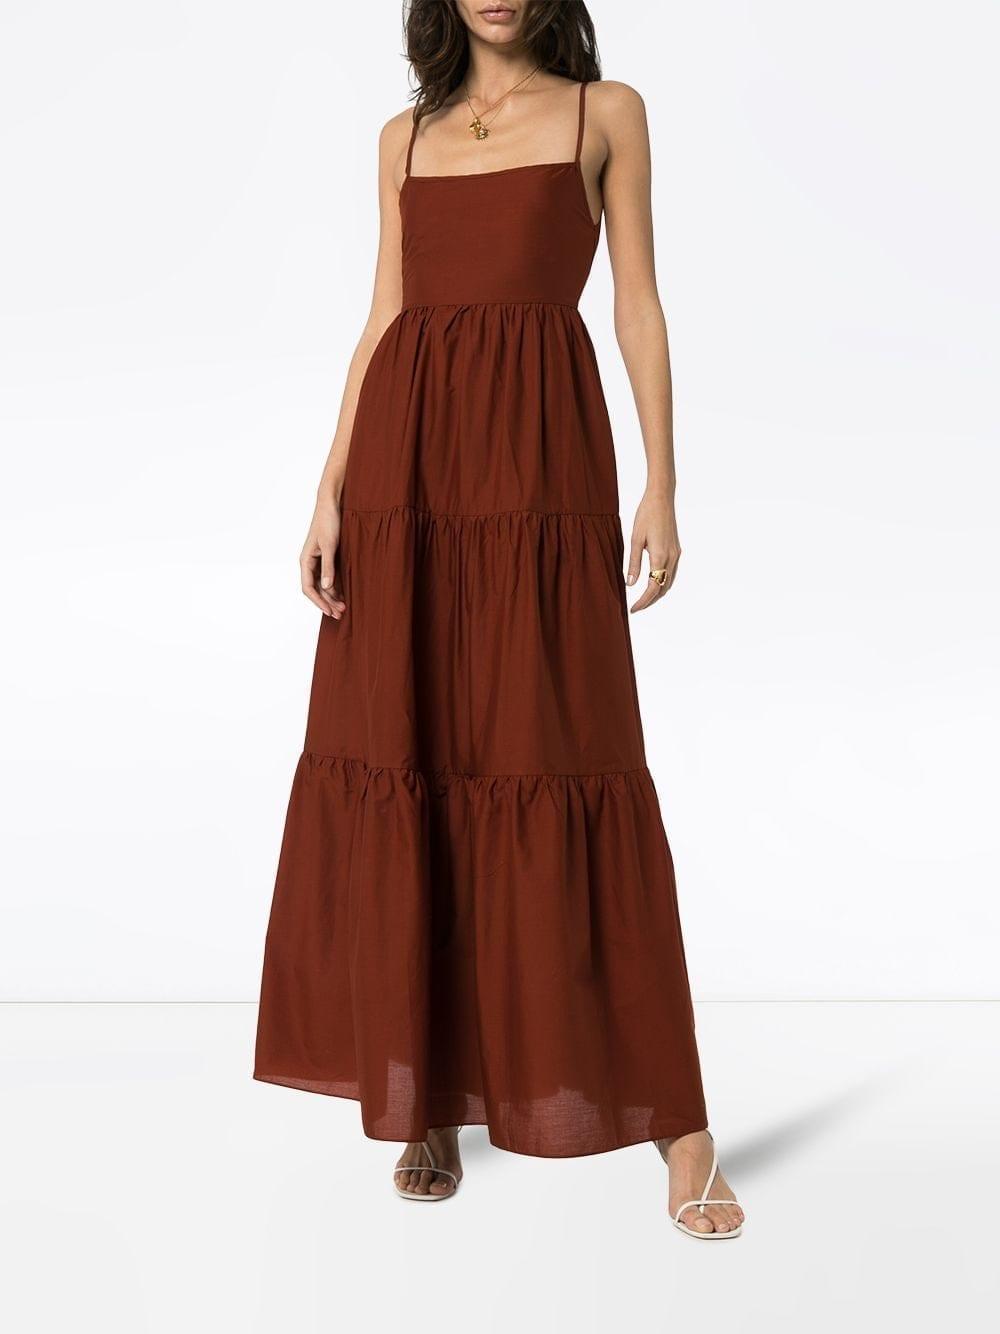 MATTEAU Tiered Maxi Dress